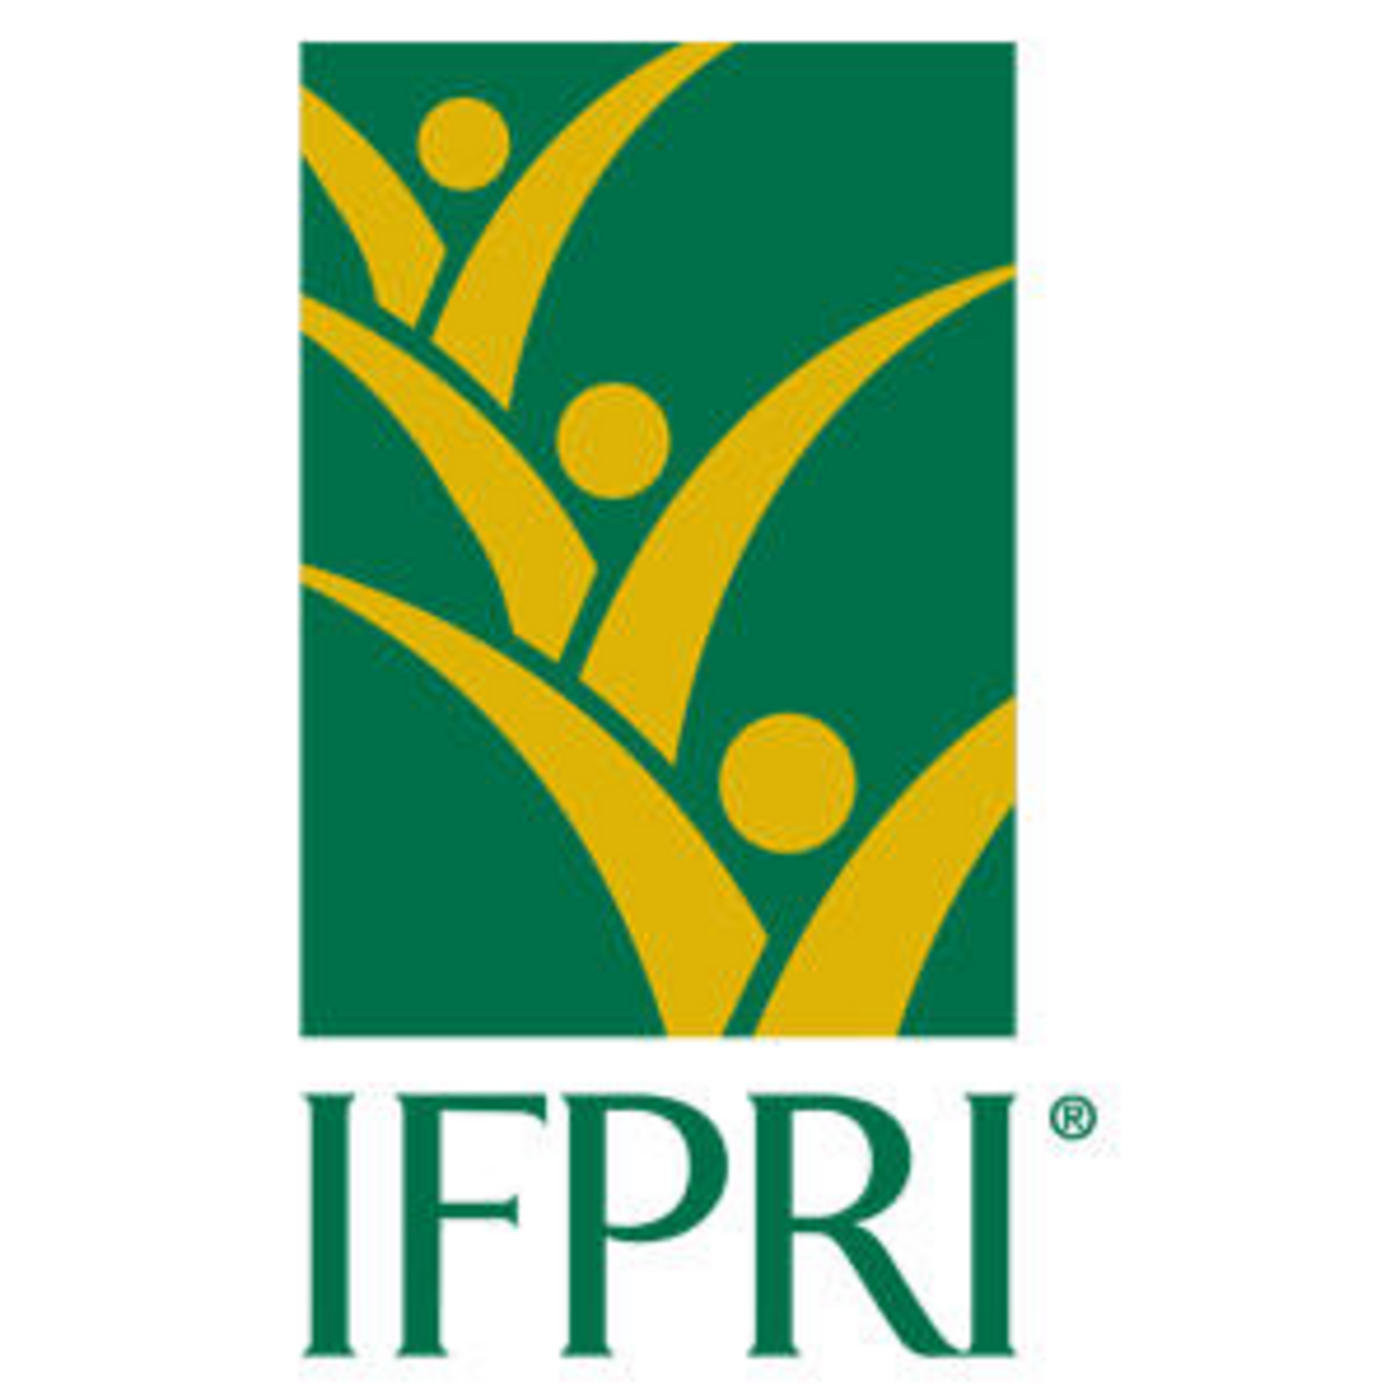 IFPRI Policy Seminar - Nov 7, 2012 - Presentation by Clemens Breisinger